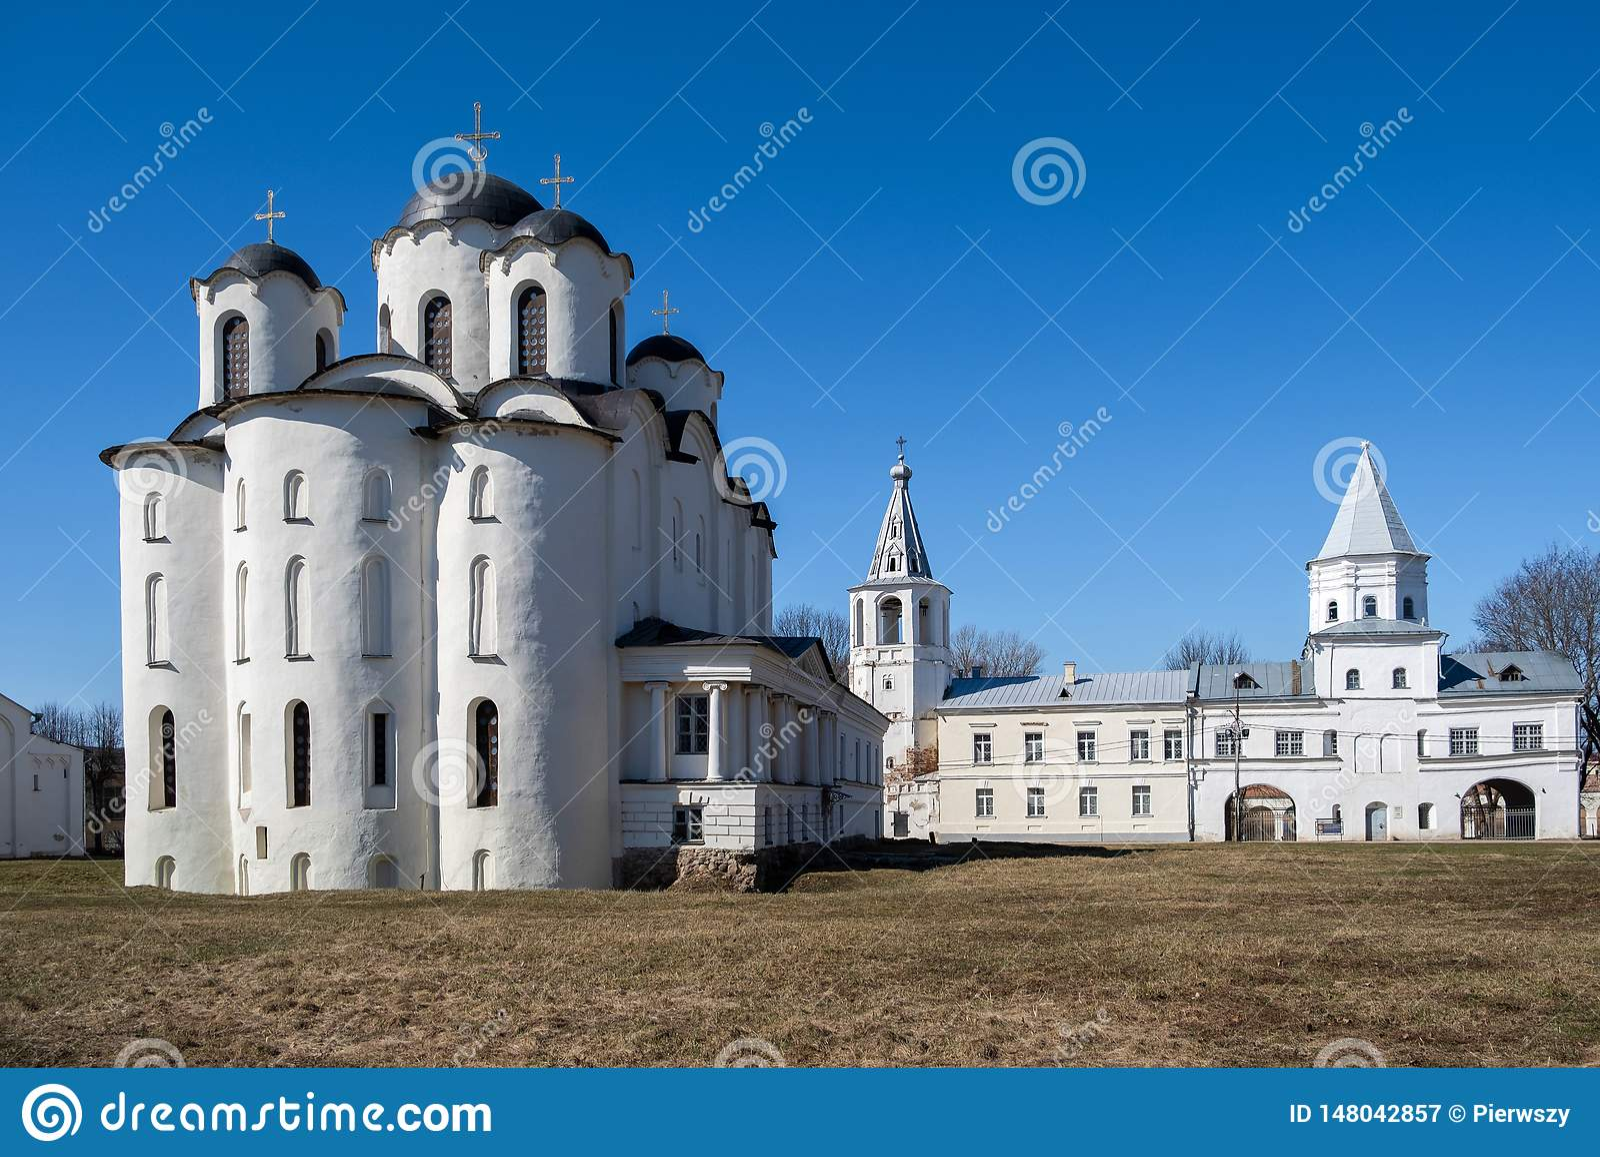 Yaroslav`s Court in Veliky Novgorod. Nikolo-Dvorishchensky Cathedral, an important historical tourist site of Russia